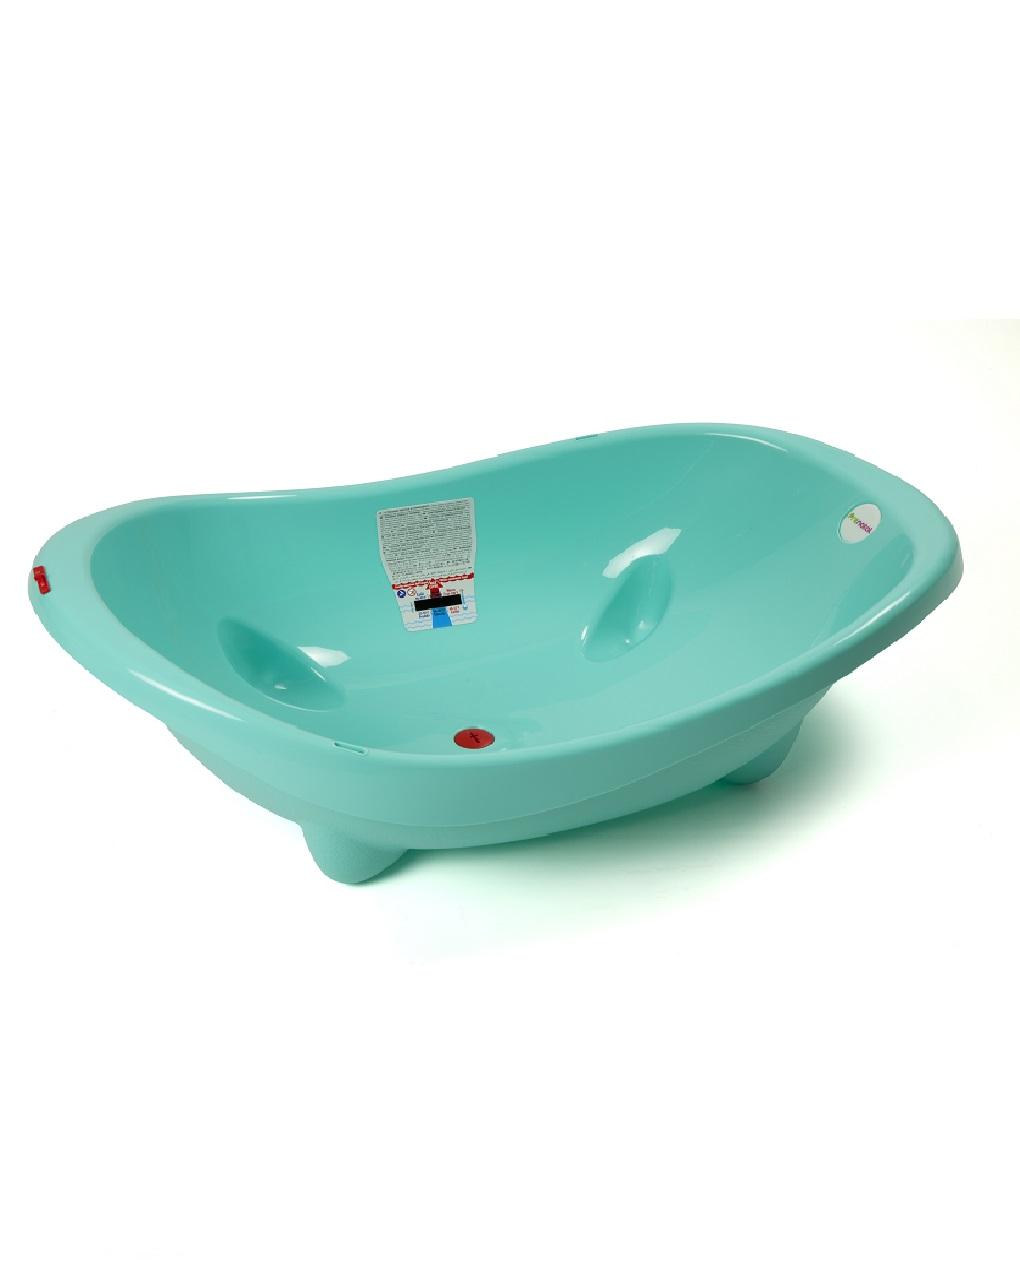 Giordani Μπανάκι Soap-Bubble Μπλέ